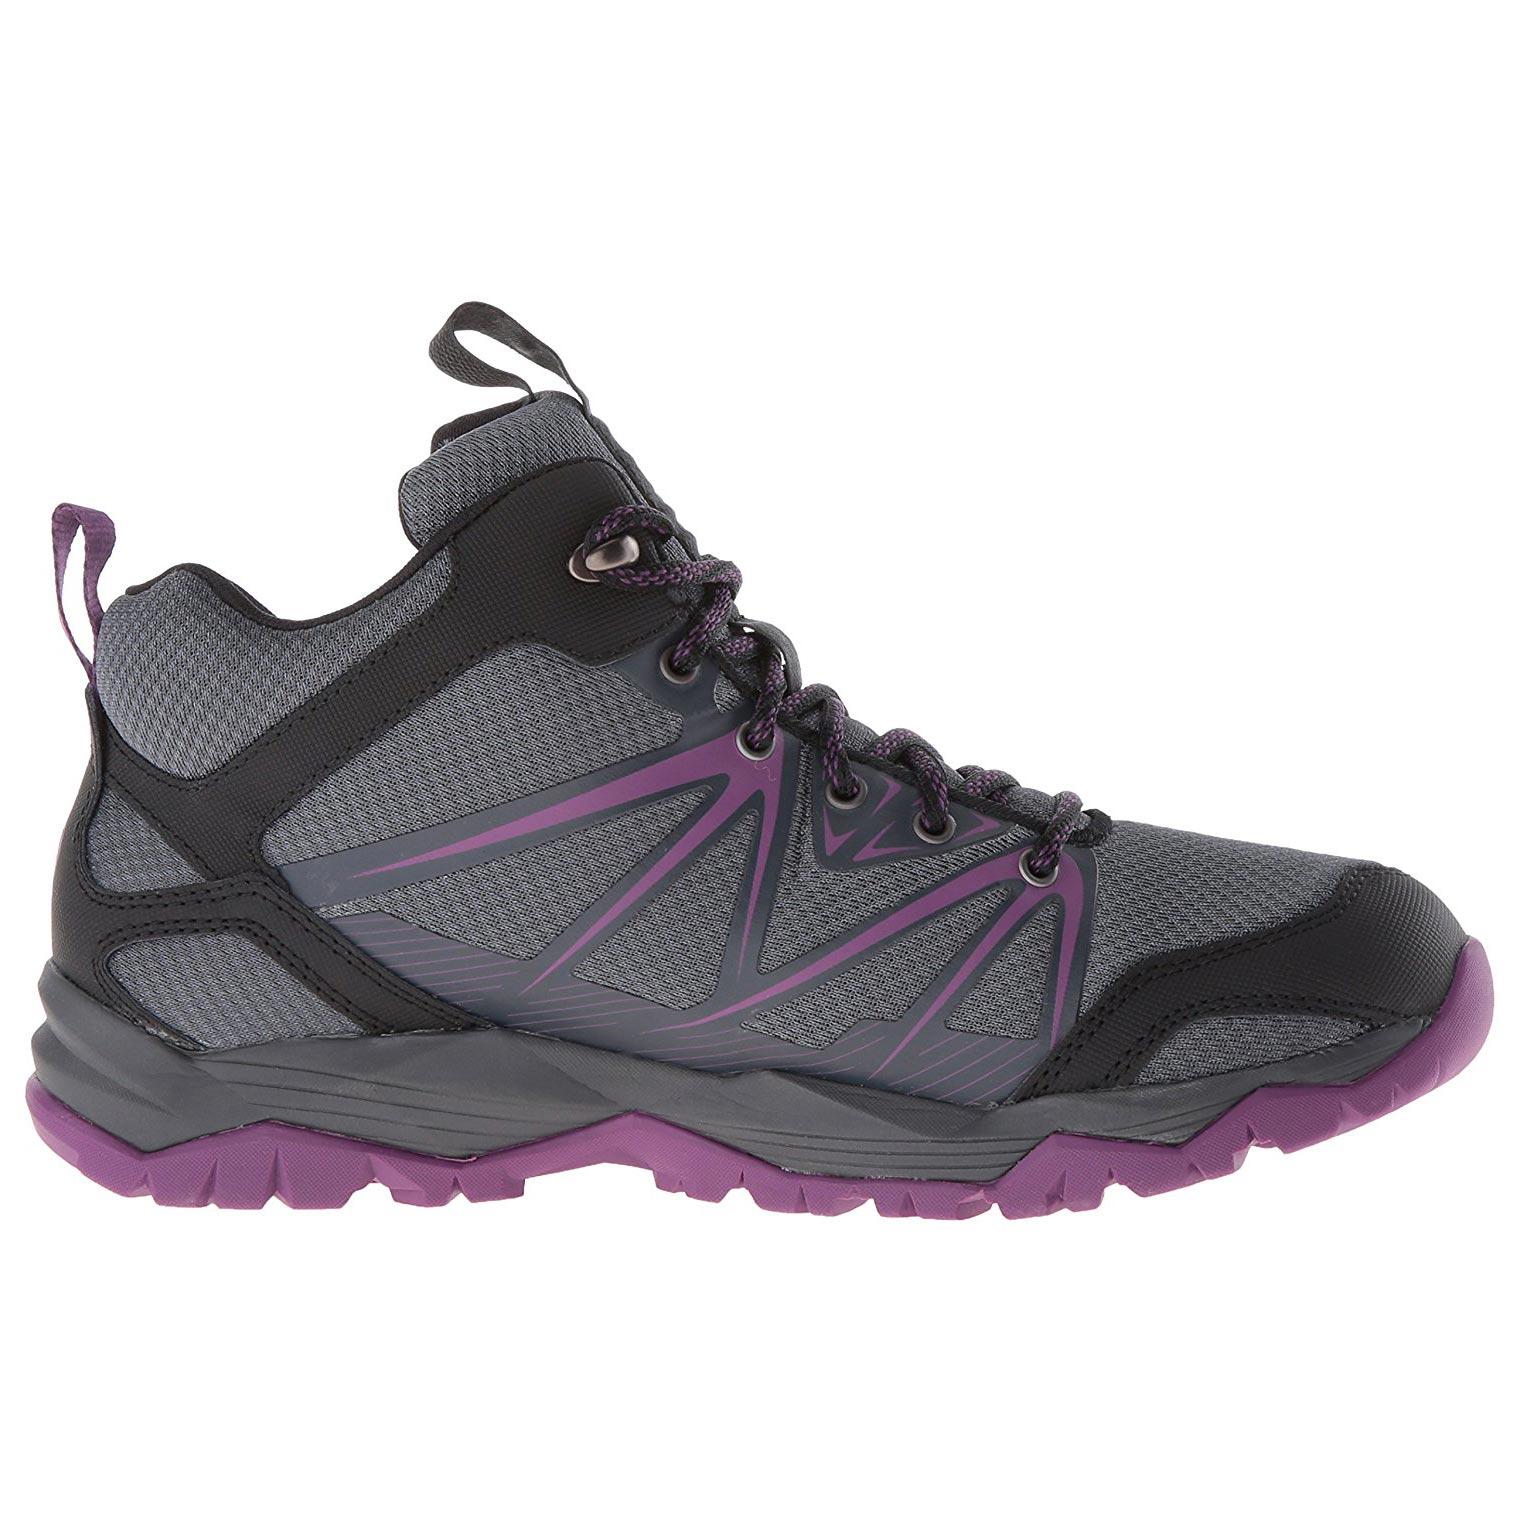 Merrell Capra Rise Zapatos de senderismo para mujer, color